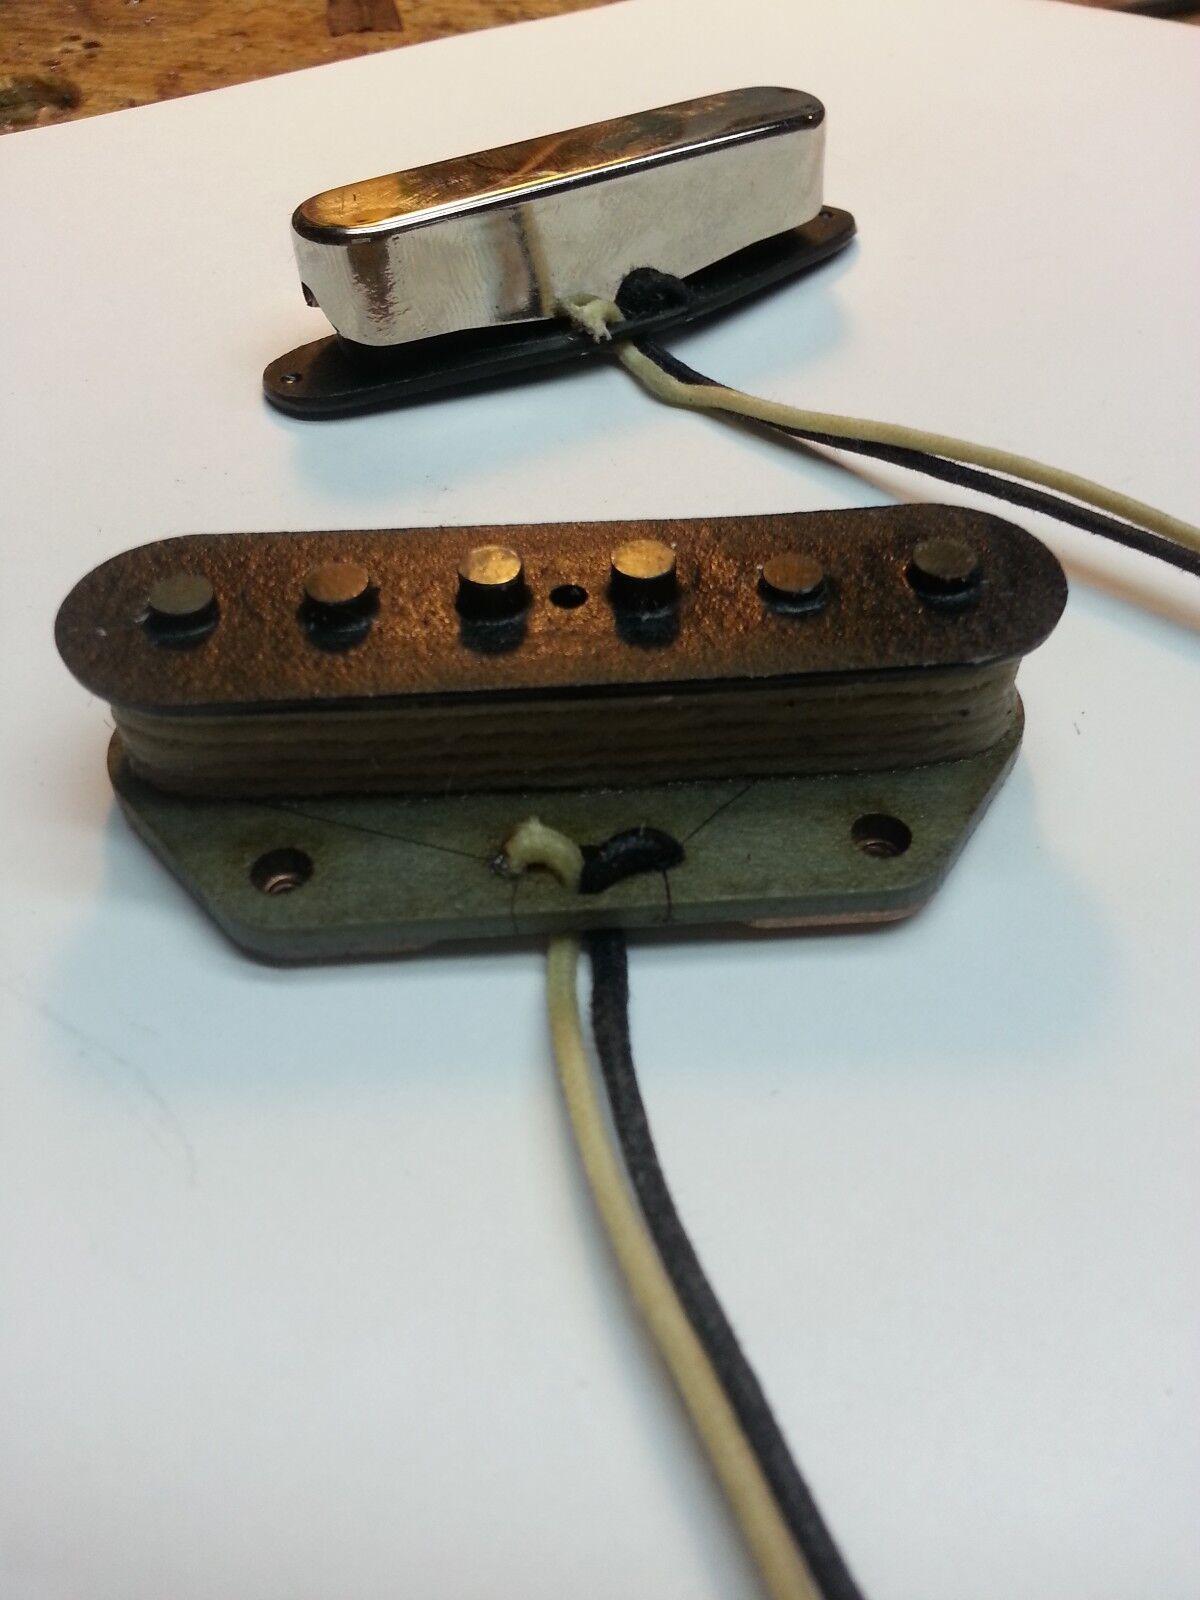 60's 70's Tele set for Fender or other restorations